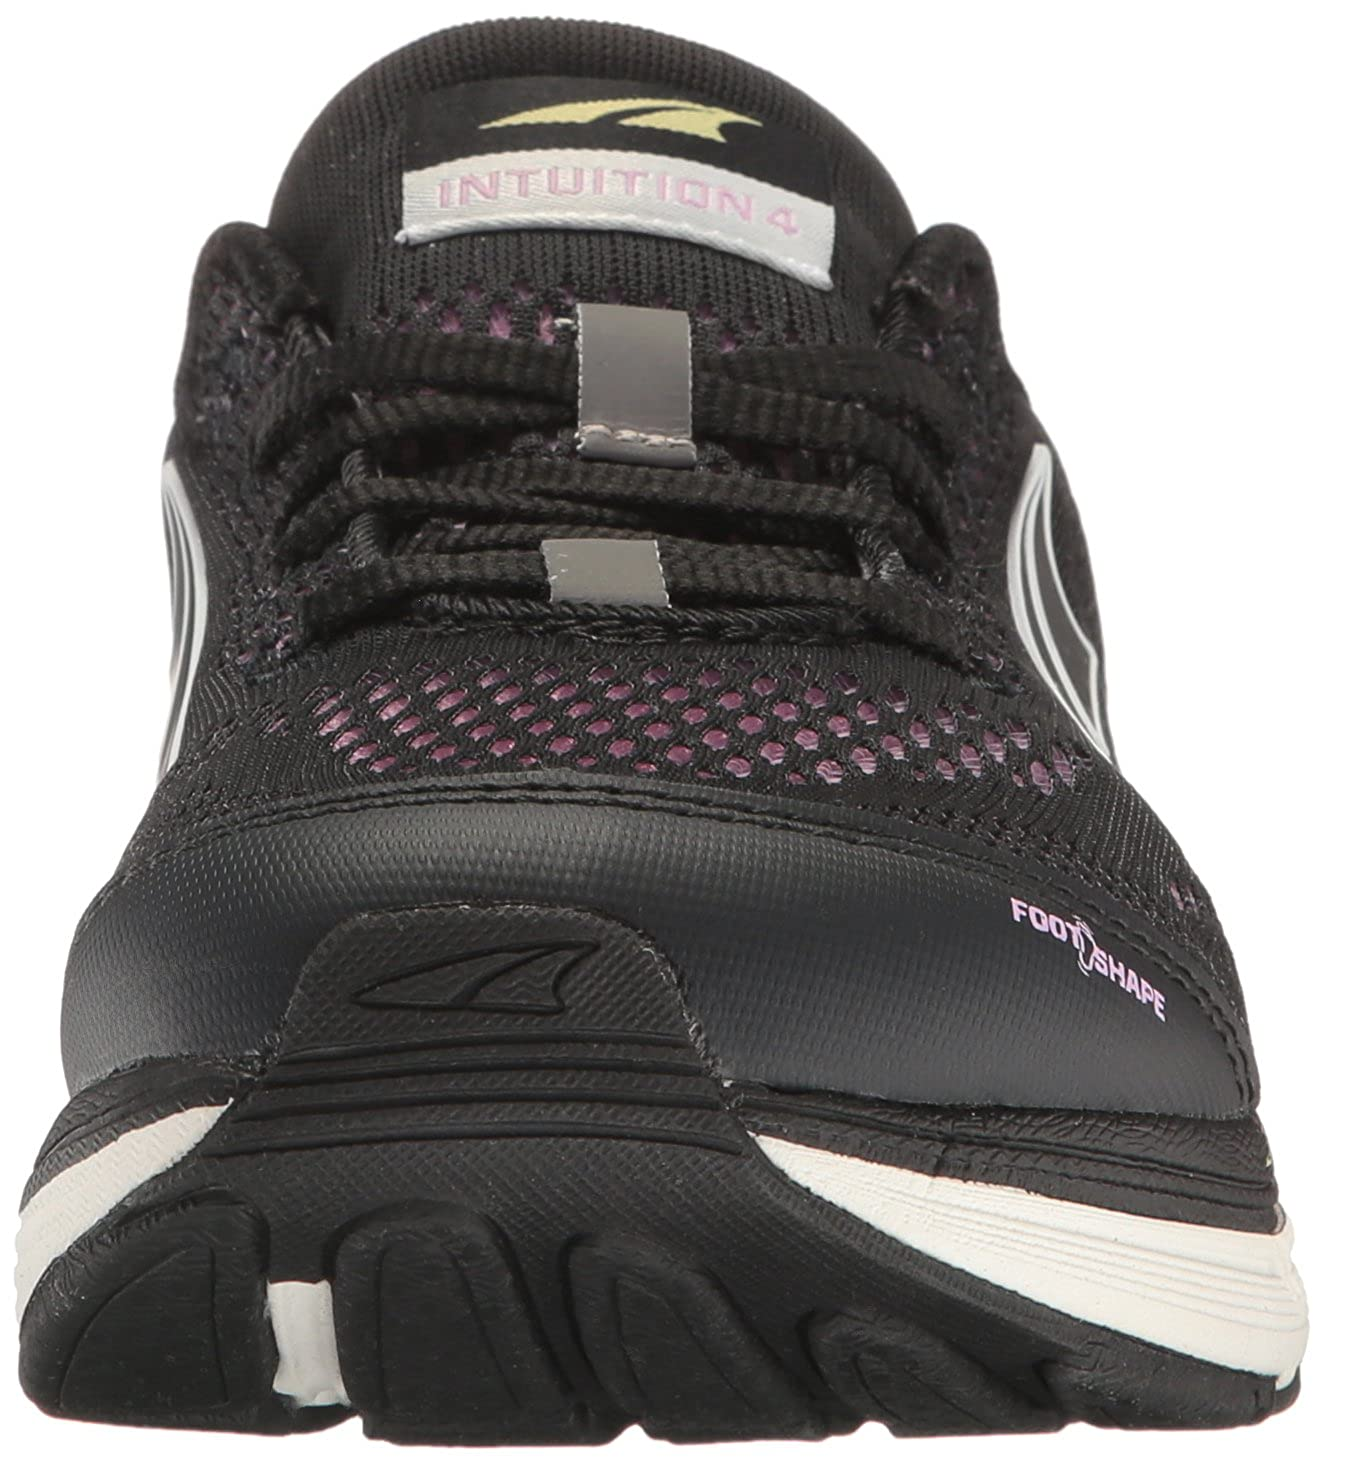 Altra Women s Intuition 4 Running Shoe